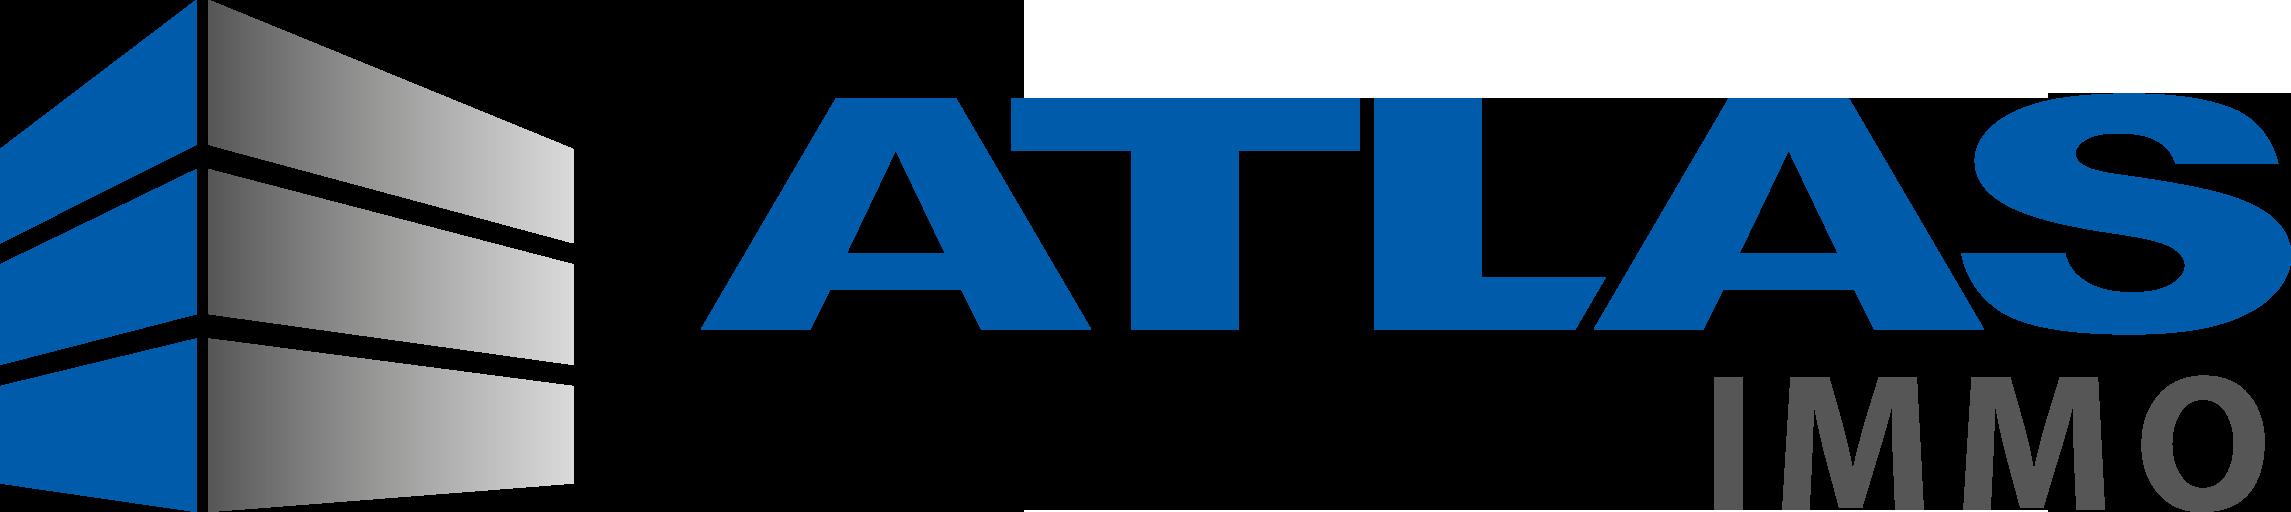 Atlas Immo GmbH Mobile Logo